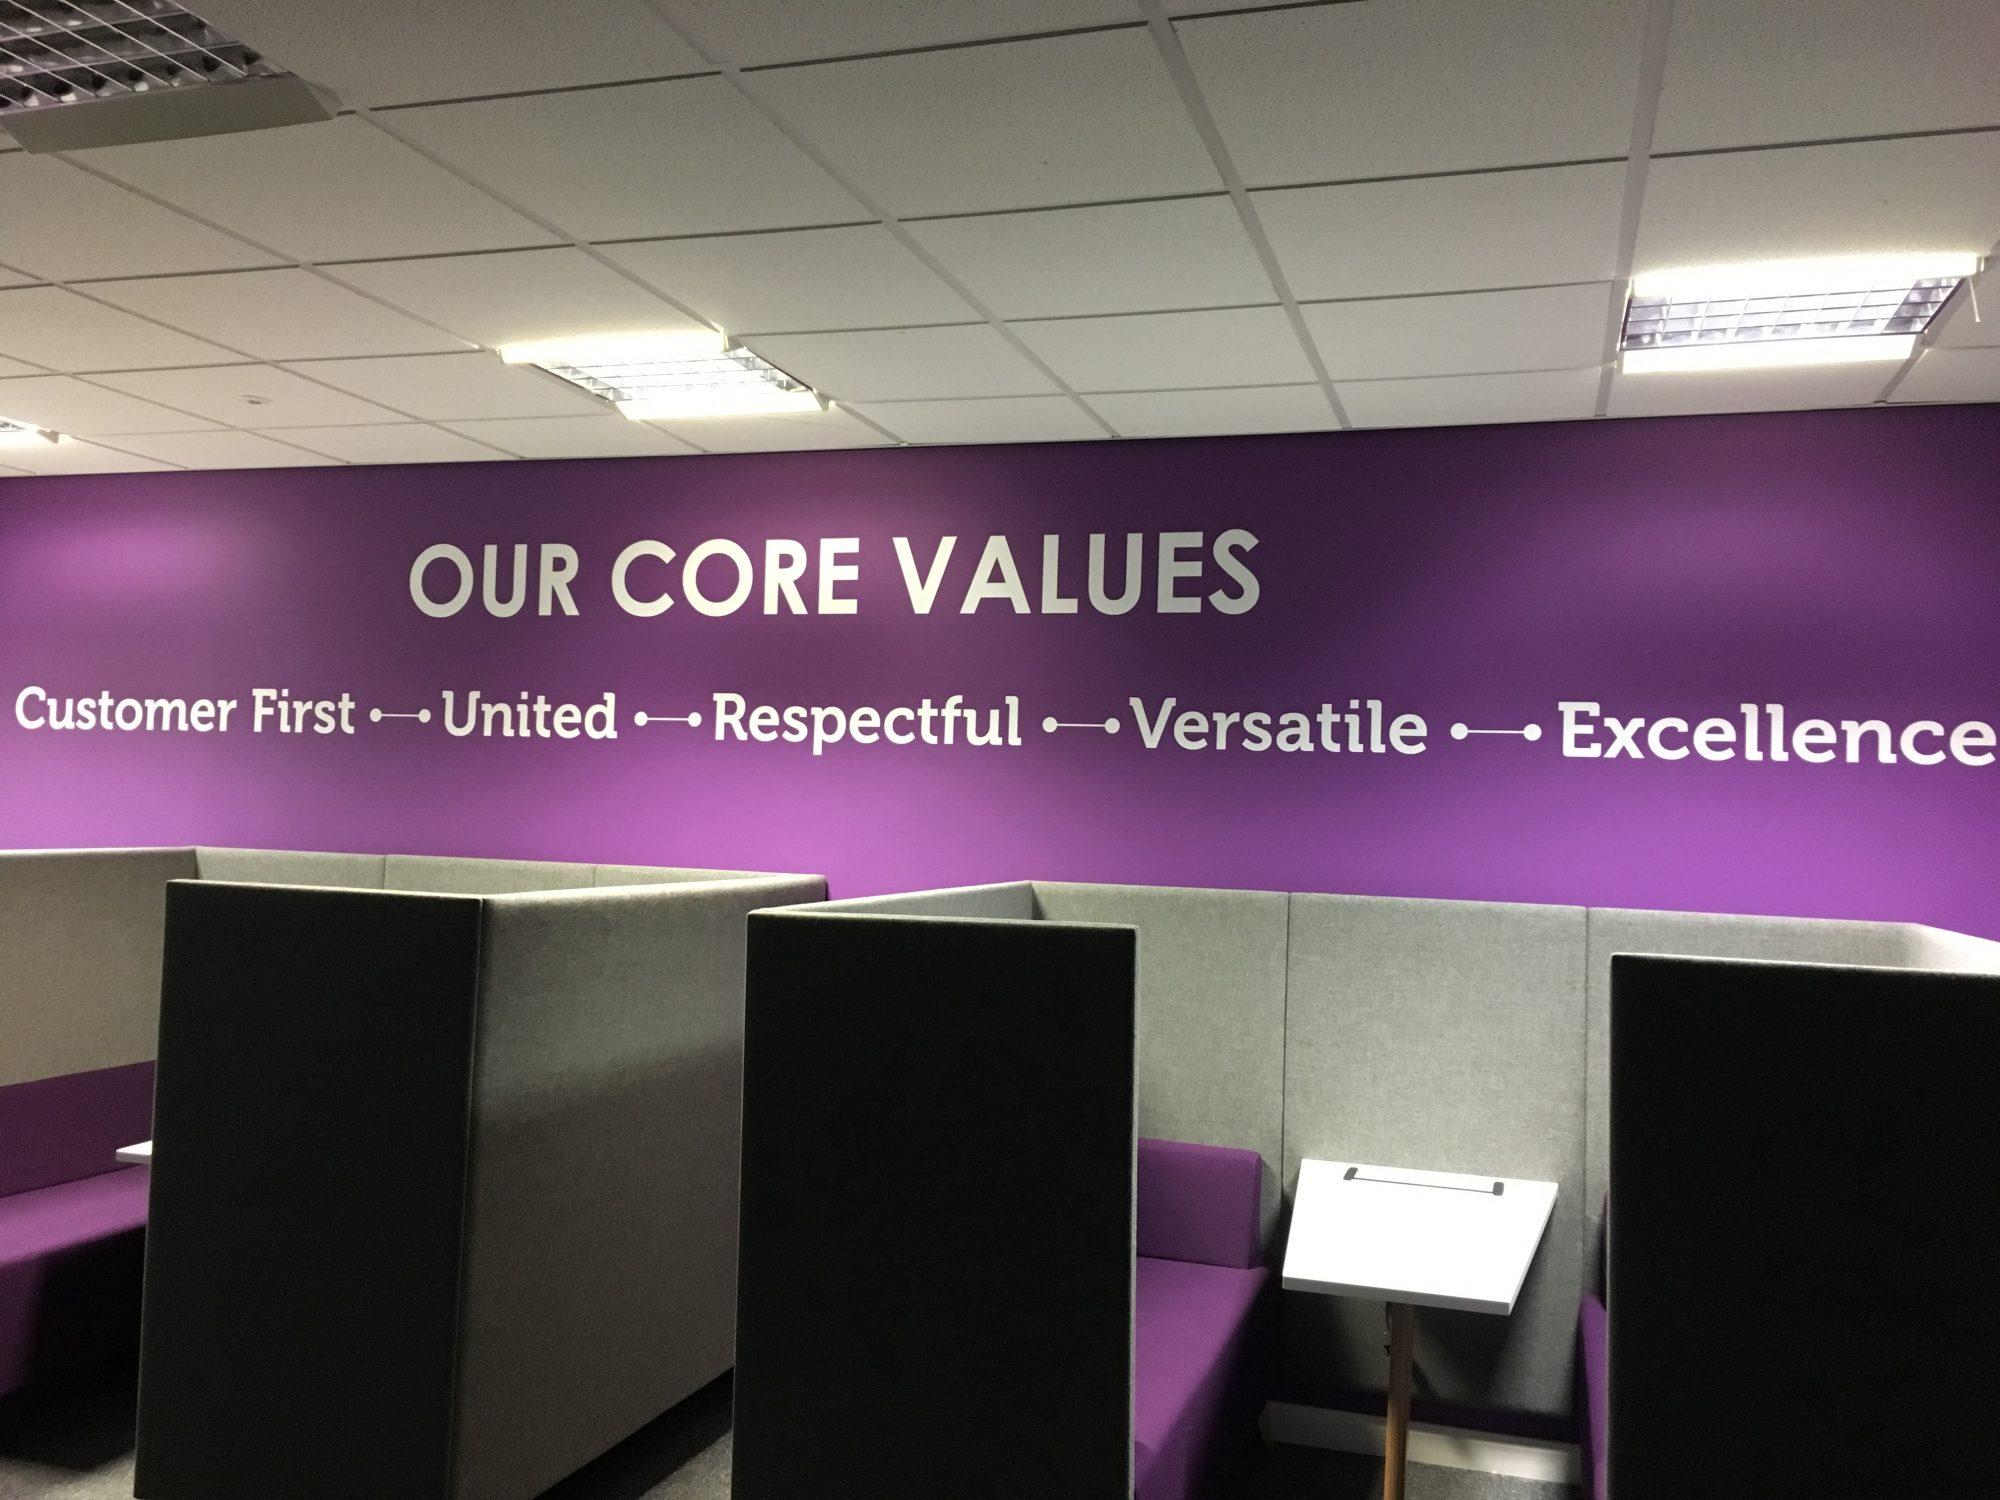 Indigo core values sign on wall